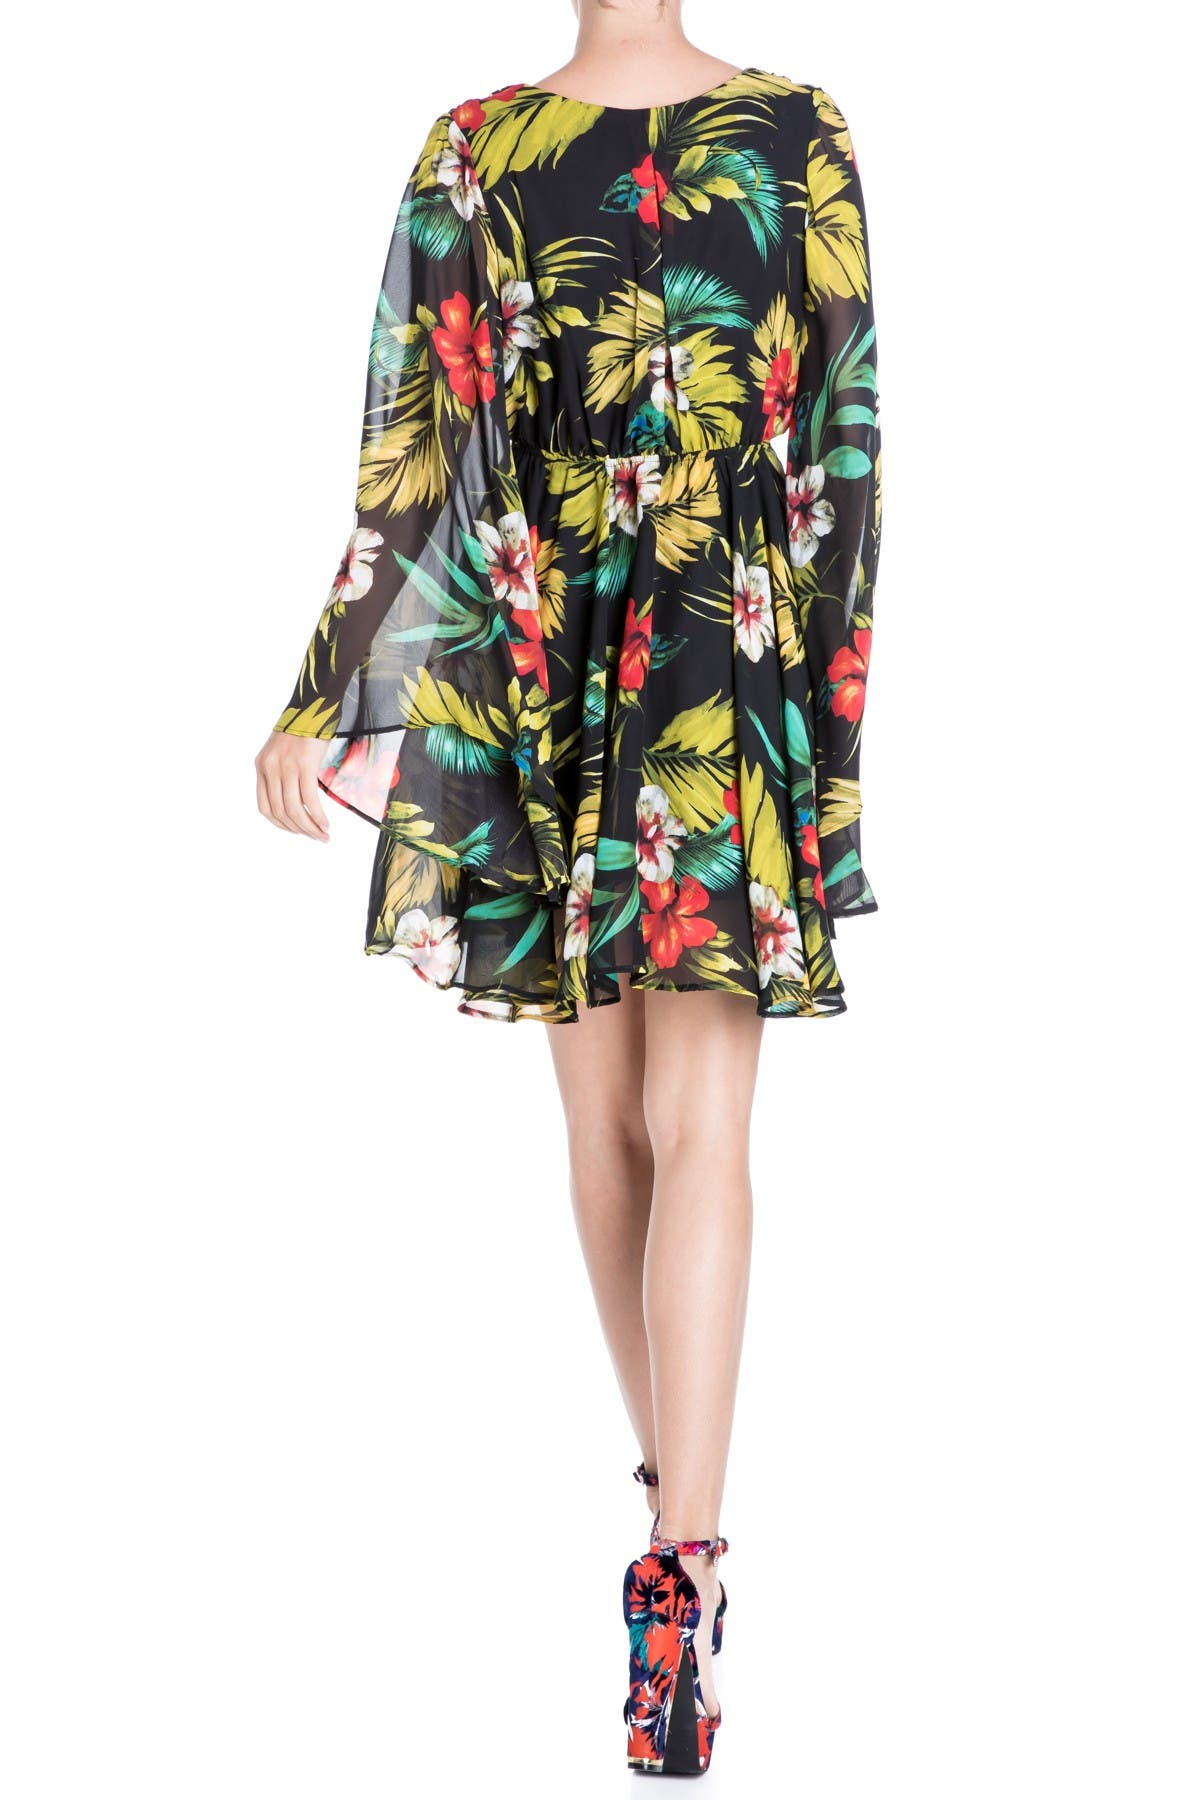 Image of Meghan LA Sunset Floral Bell Sleeve Mini Dress